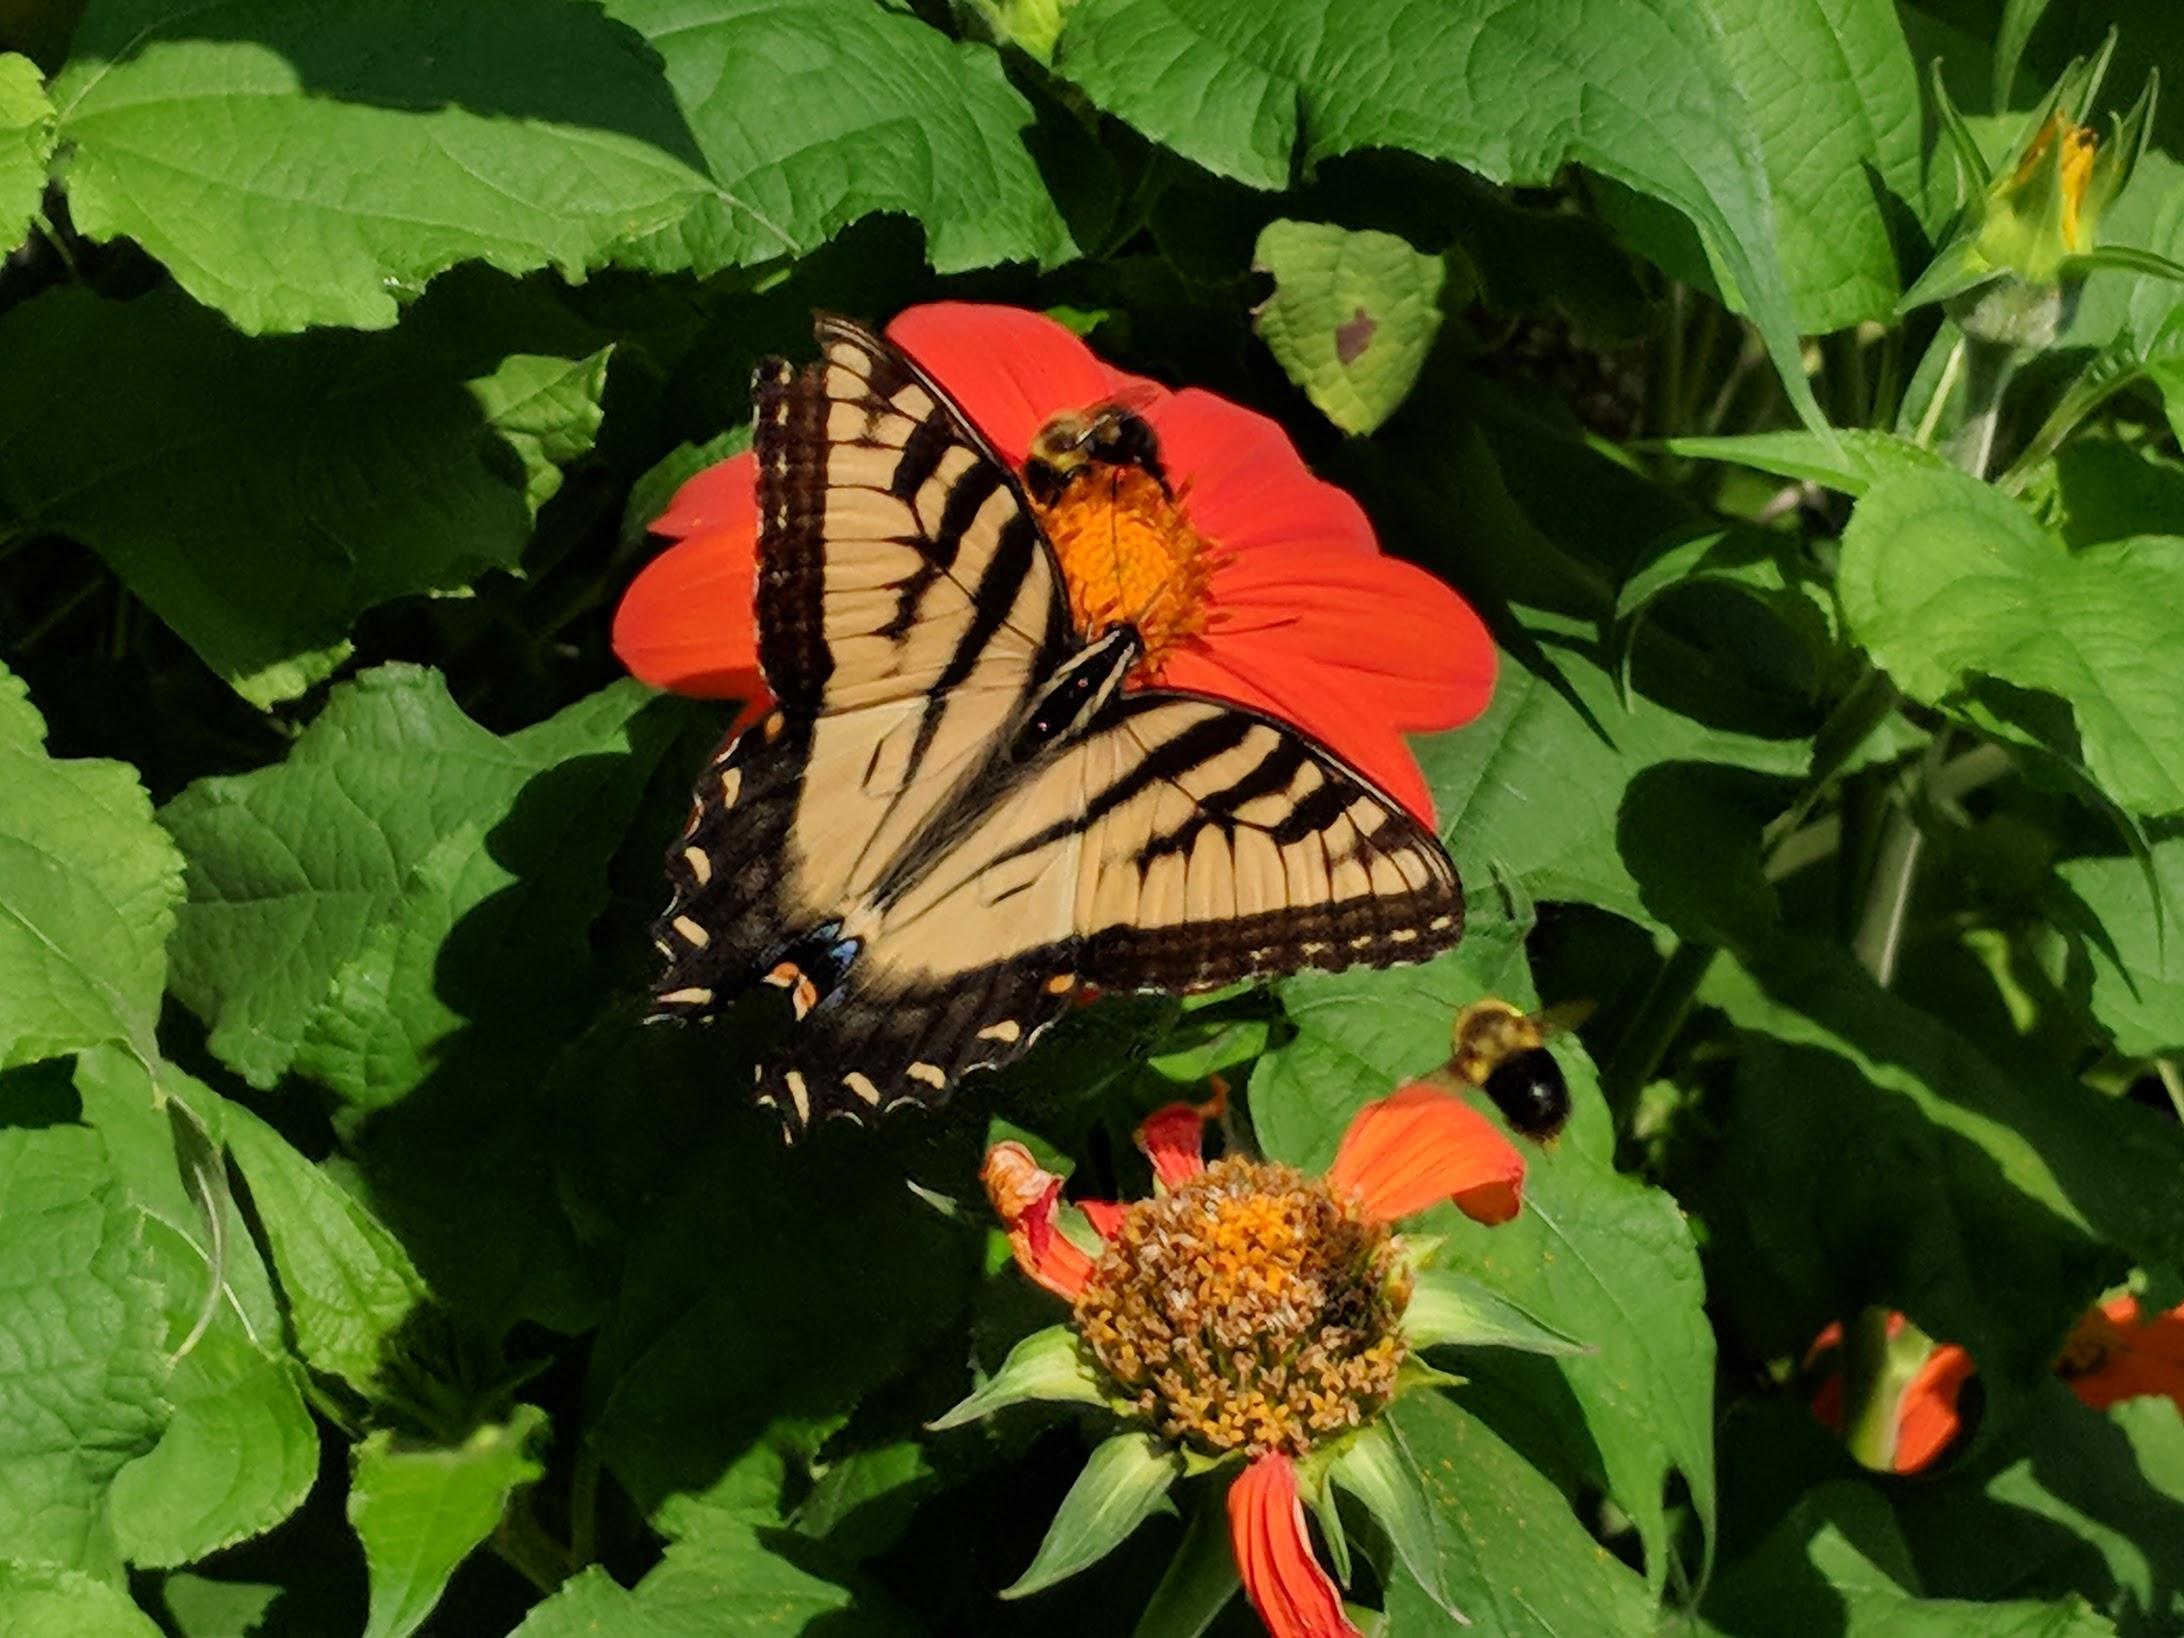 2018-08-24-tithonia-swallowtail-2-bees.jpg